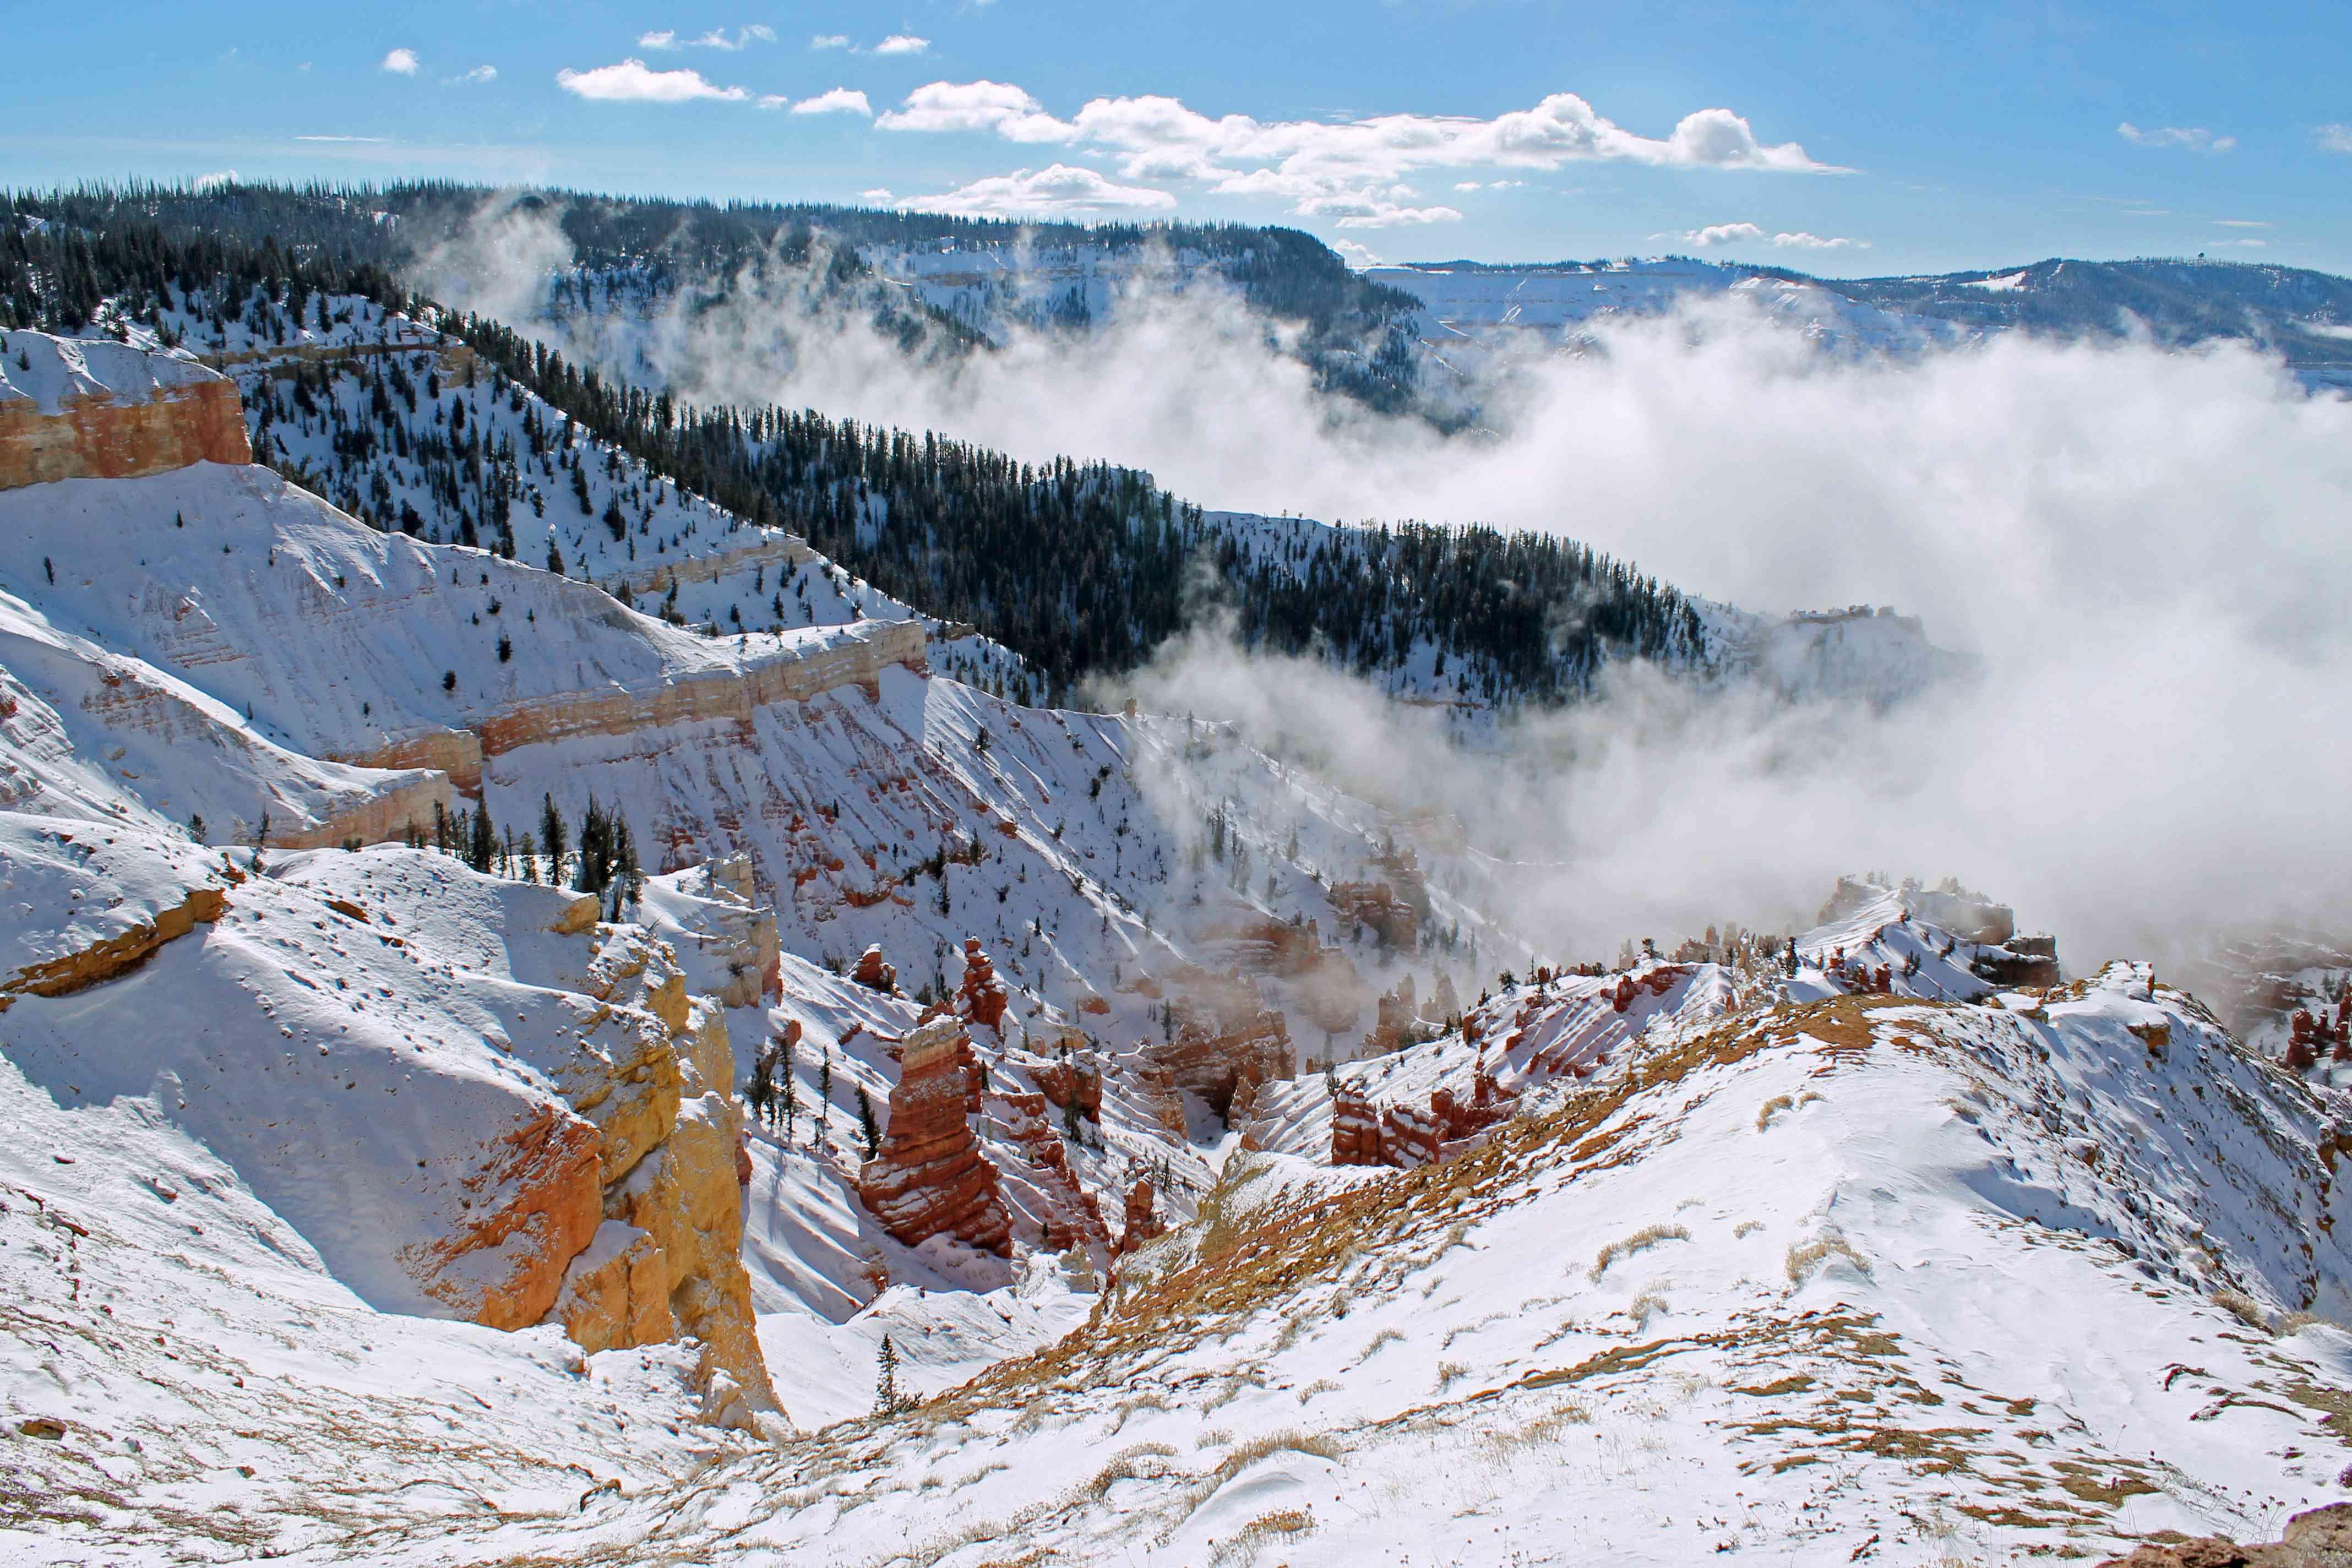 Clouds over snowy mountains, Brian Head, Utah, USA